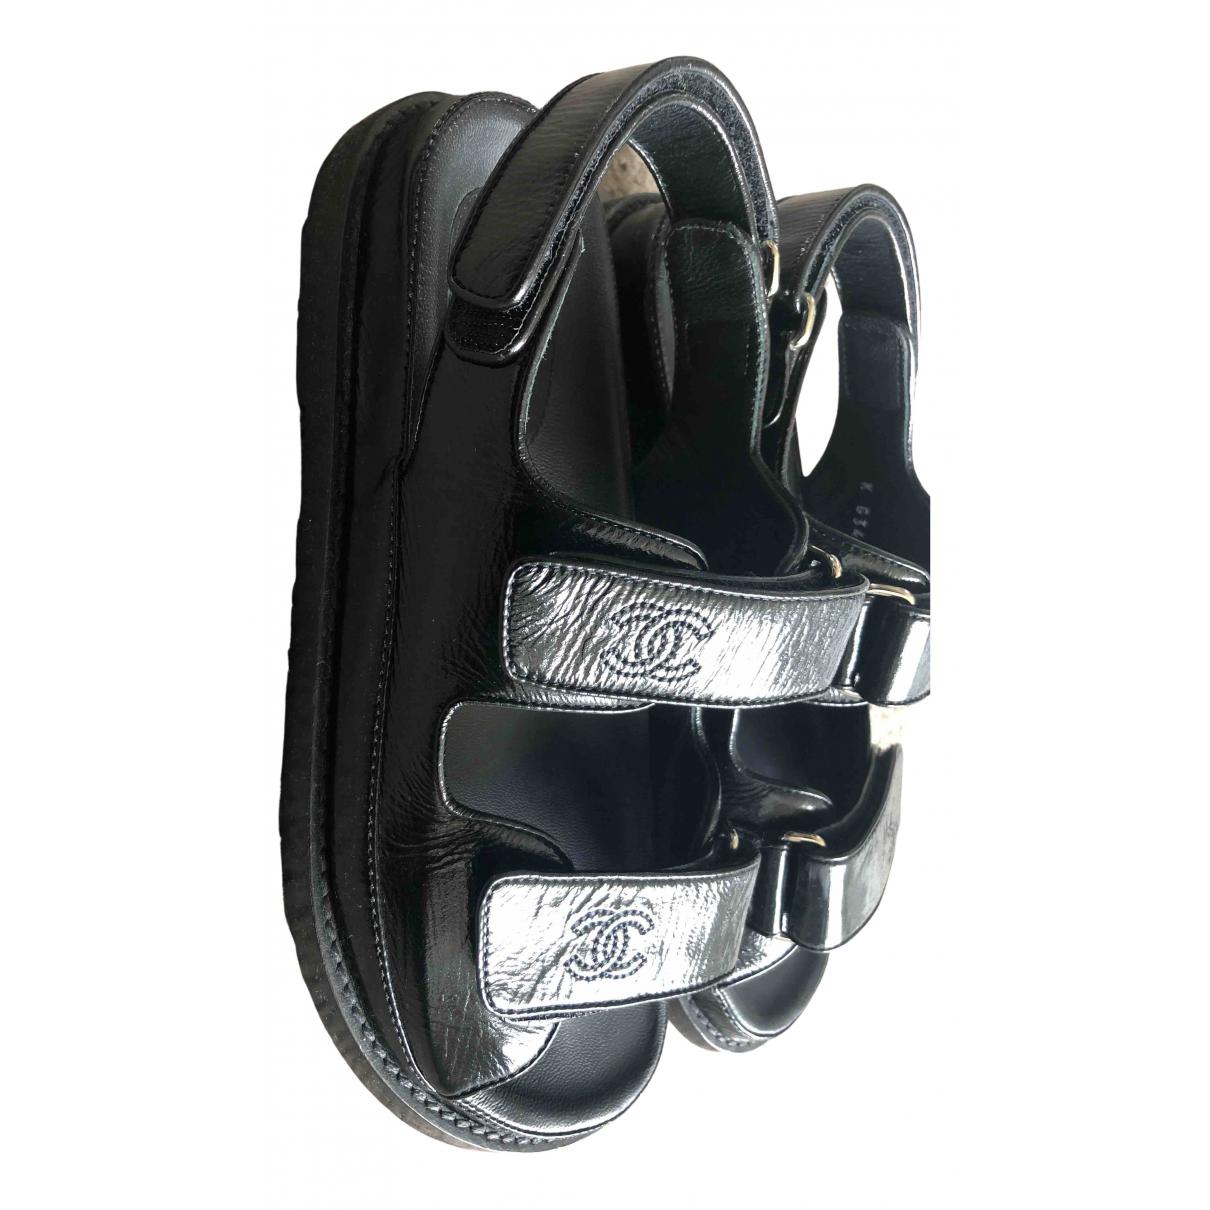 Chanel Dad Sandals Sandalen in  Schwarz Lackleder